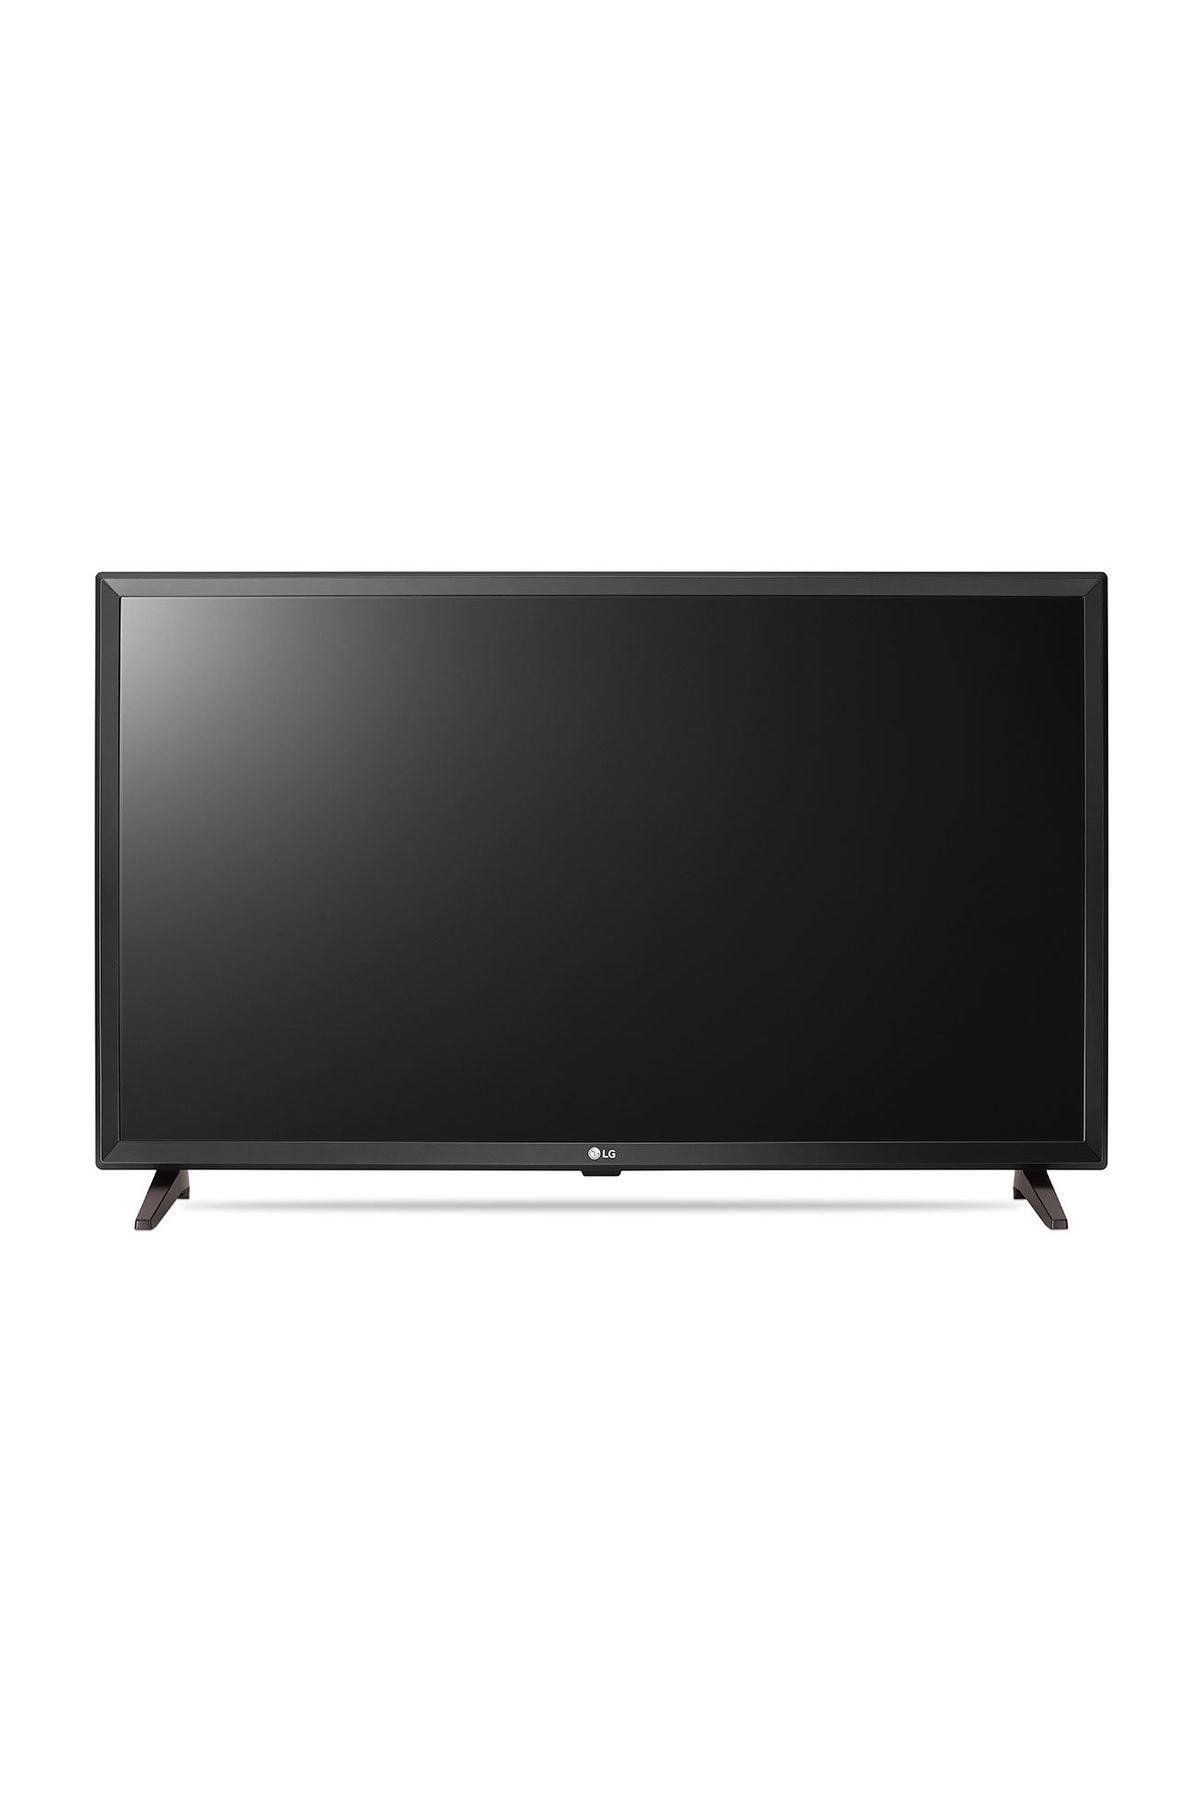 "LG 32TL420U-PZ 32"" 81 Ekran Uydu Alıcılı HD Ready LED Monitör TV 1"